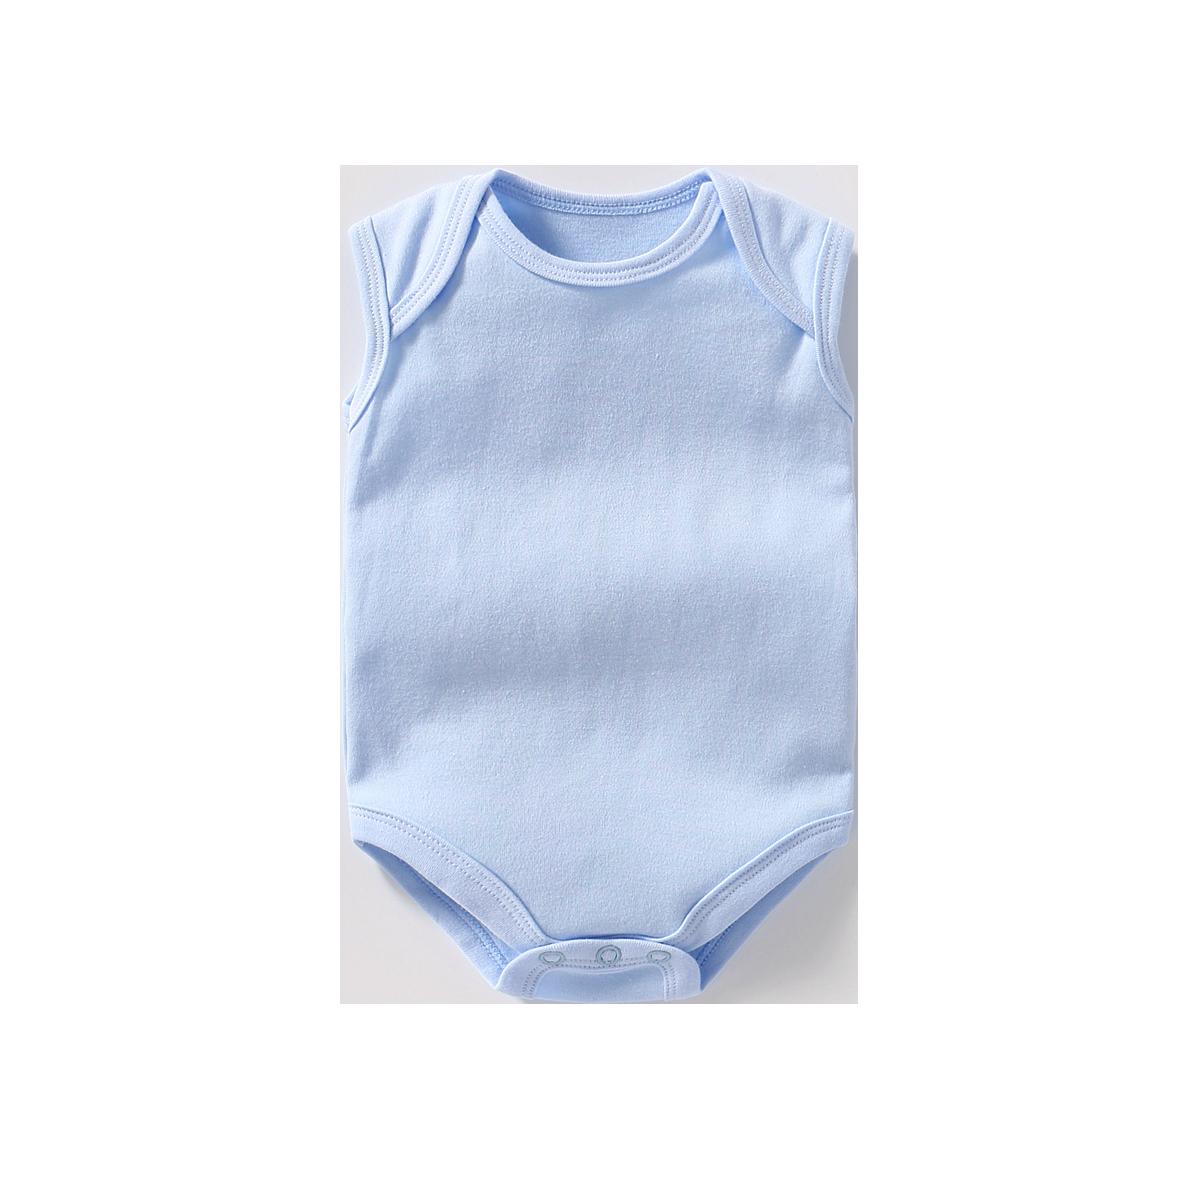 Strampler Baby Baby Sleeveless Vests Bodysuit Sleepsuits Newborn 0 3 Months 3 6 Months Boy Girl